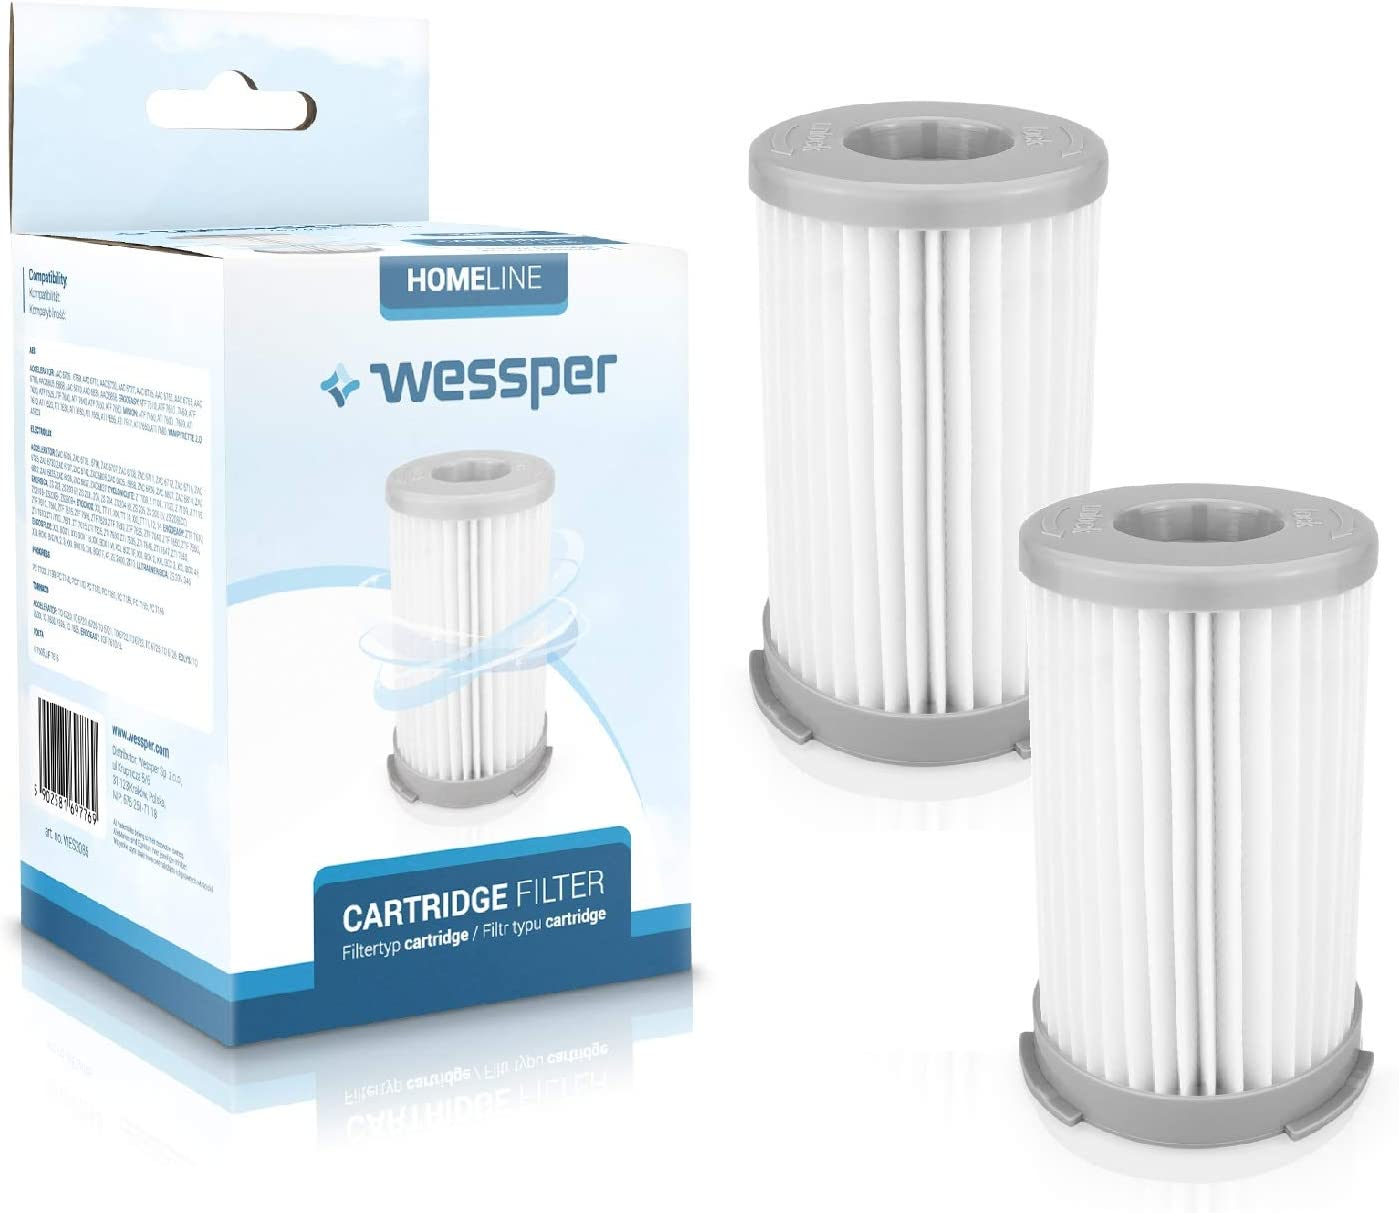 Wessper 2X Cyclone Filtro HEPA EF75B UF71B para Electrolux Ergospace ZE2410 para aspiradora: Amazon.es: Hogar